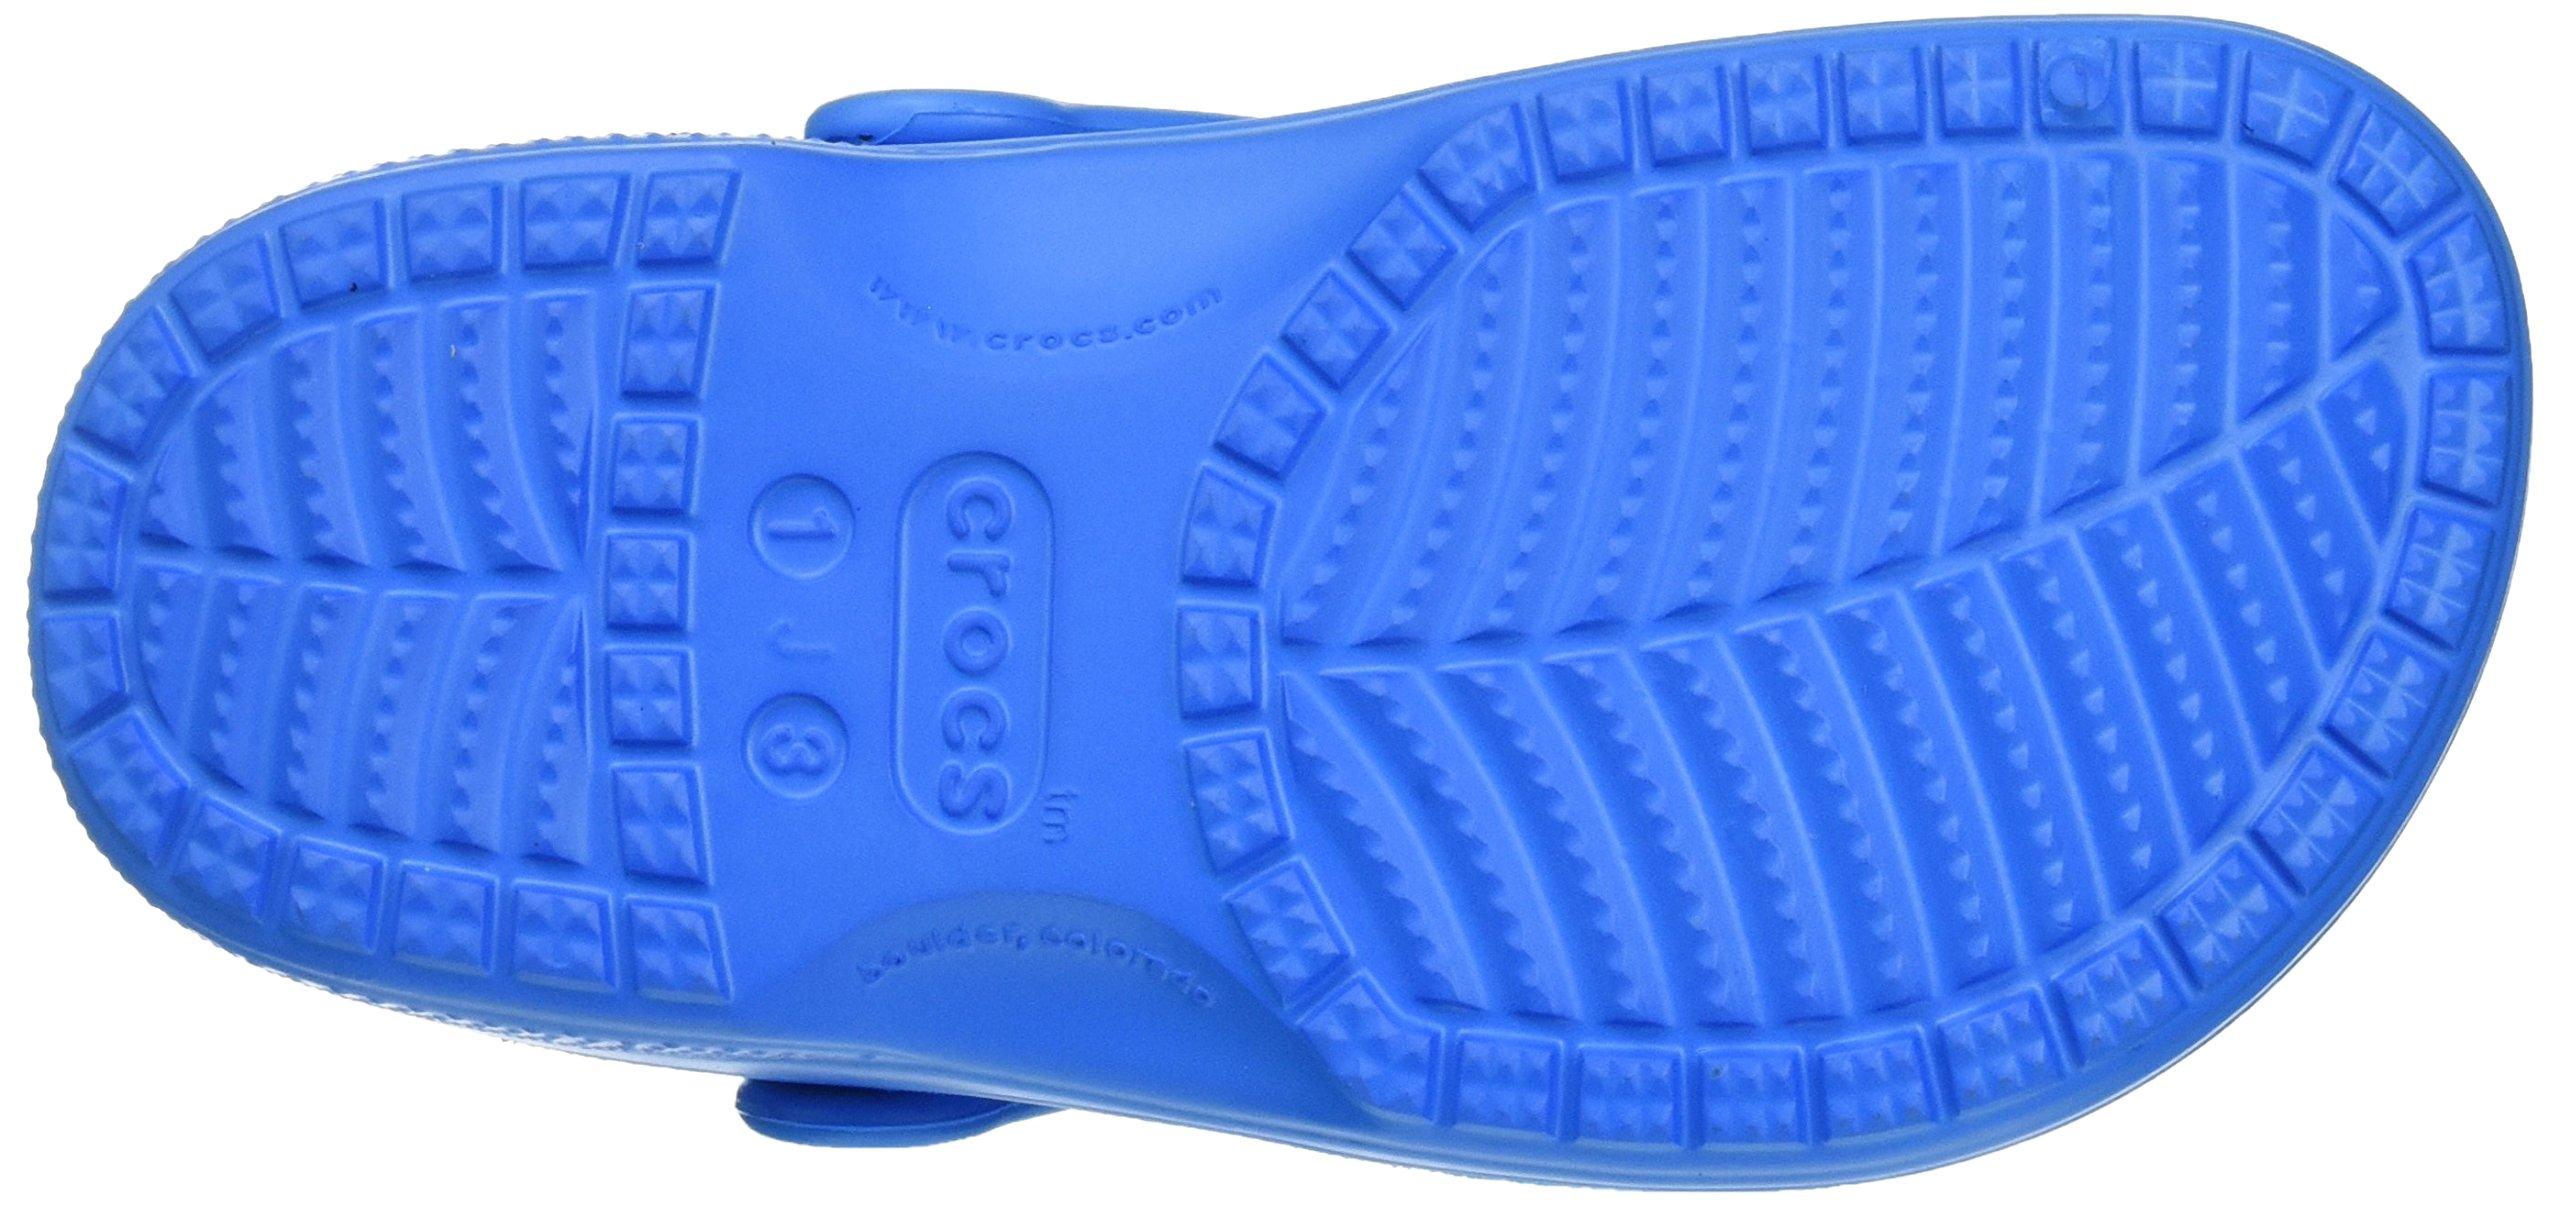 Crocs Kids' Baya 10190 Clog, Ocean, 8-9 M US Toddler by Crocs (Image #3)